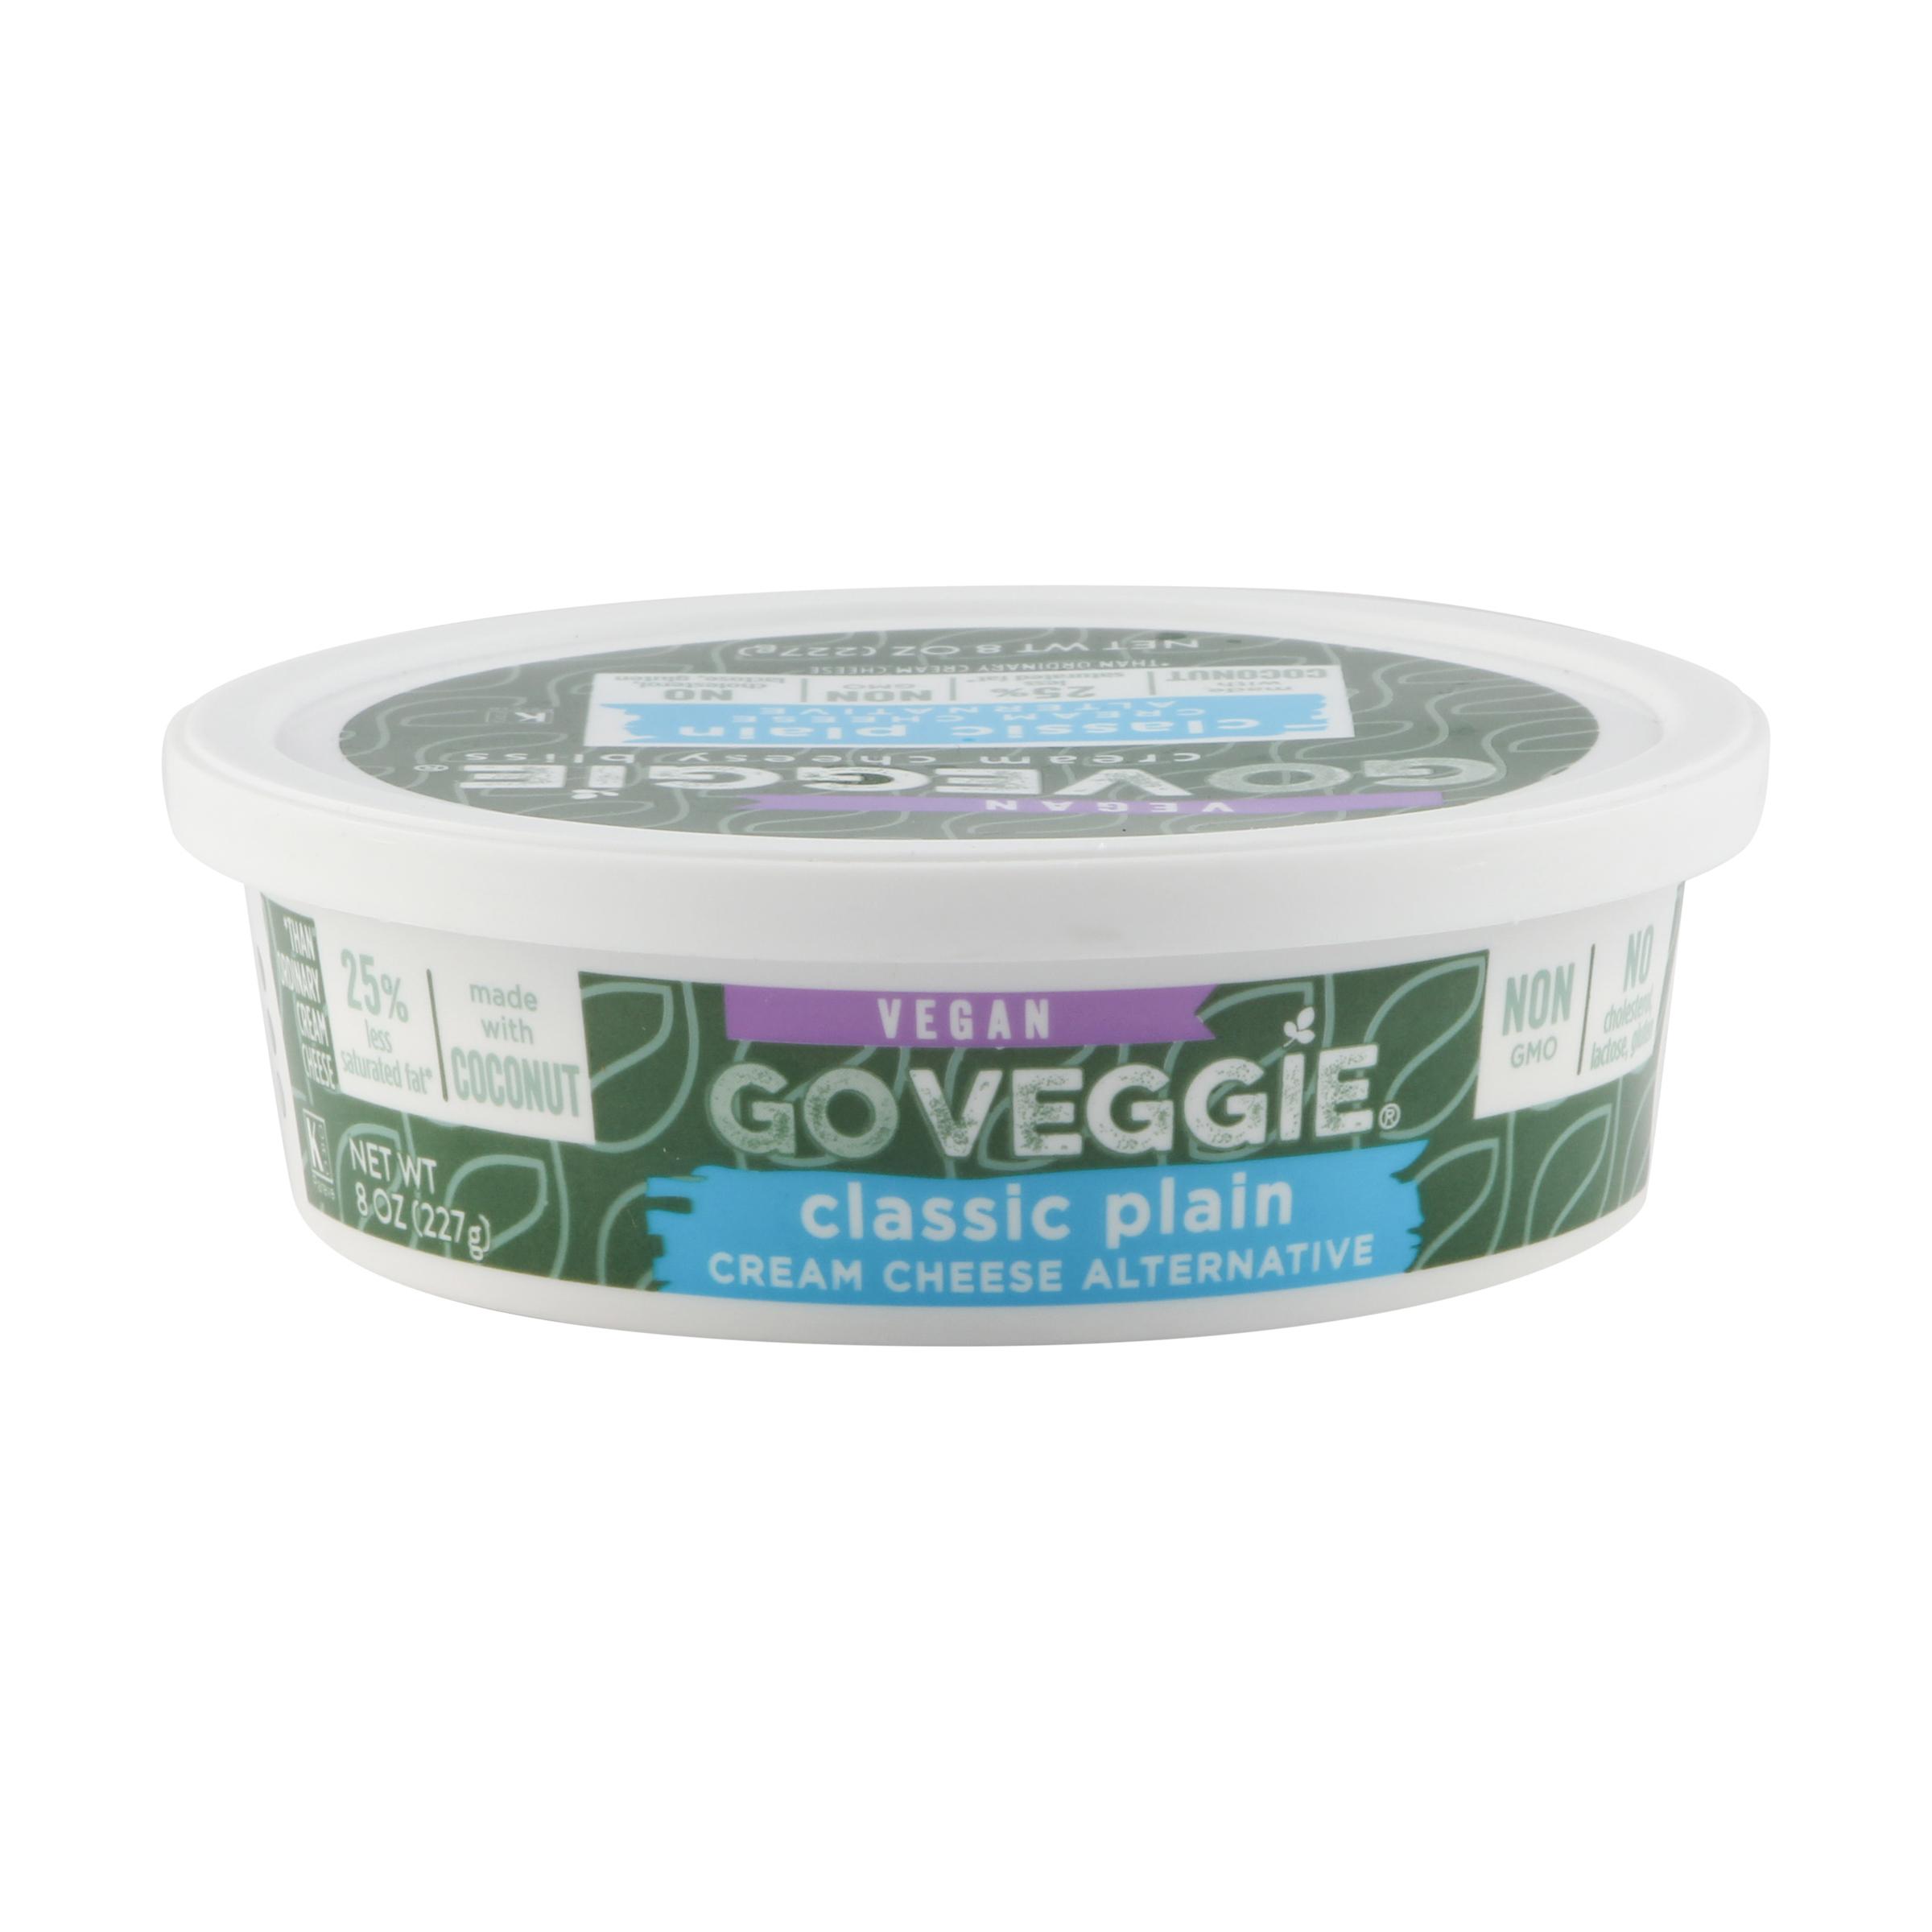 Classic Plain Cream Cheese Alternative 8 Oz Go Veggie Whole Foods Market